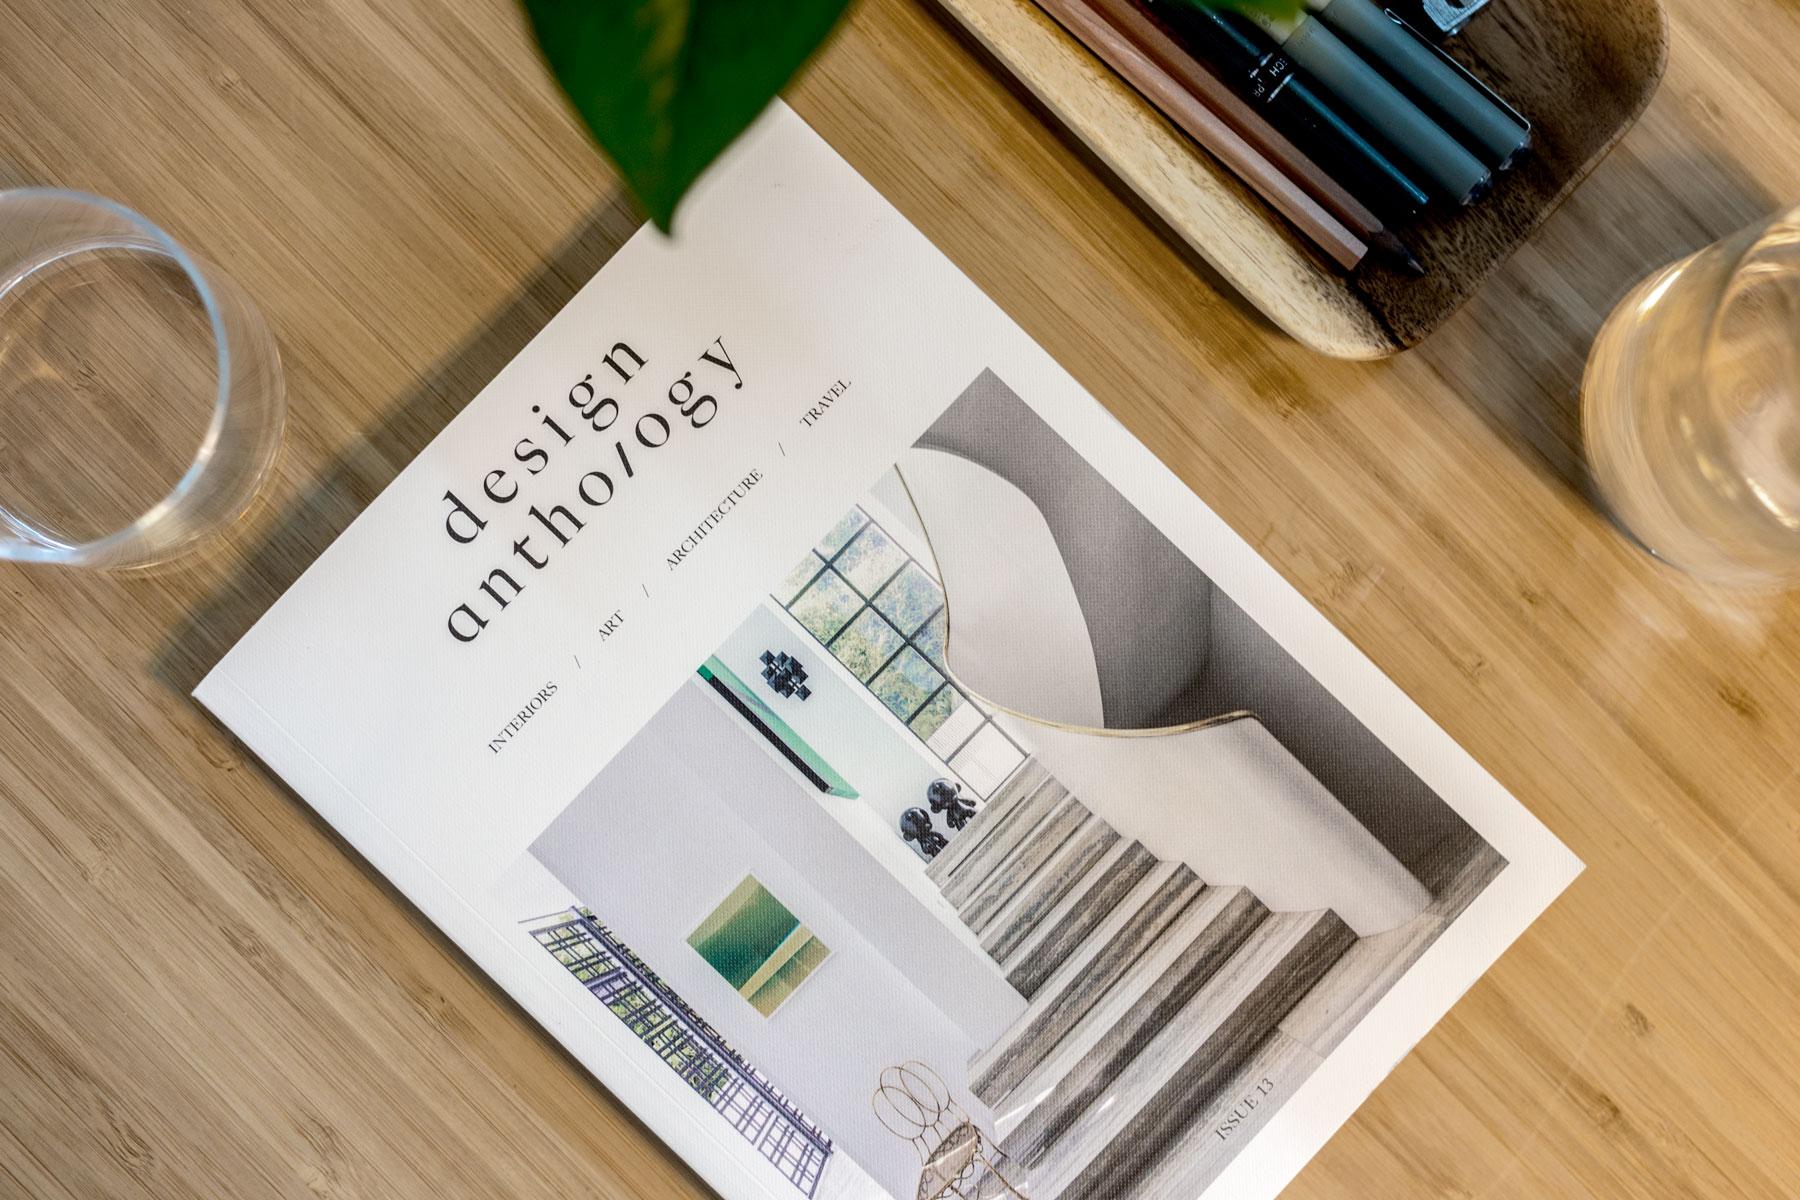 Issue 13 of  Design Anthology . (Jeremy Smart for  Aerostorie )